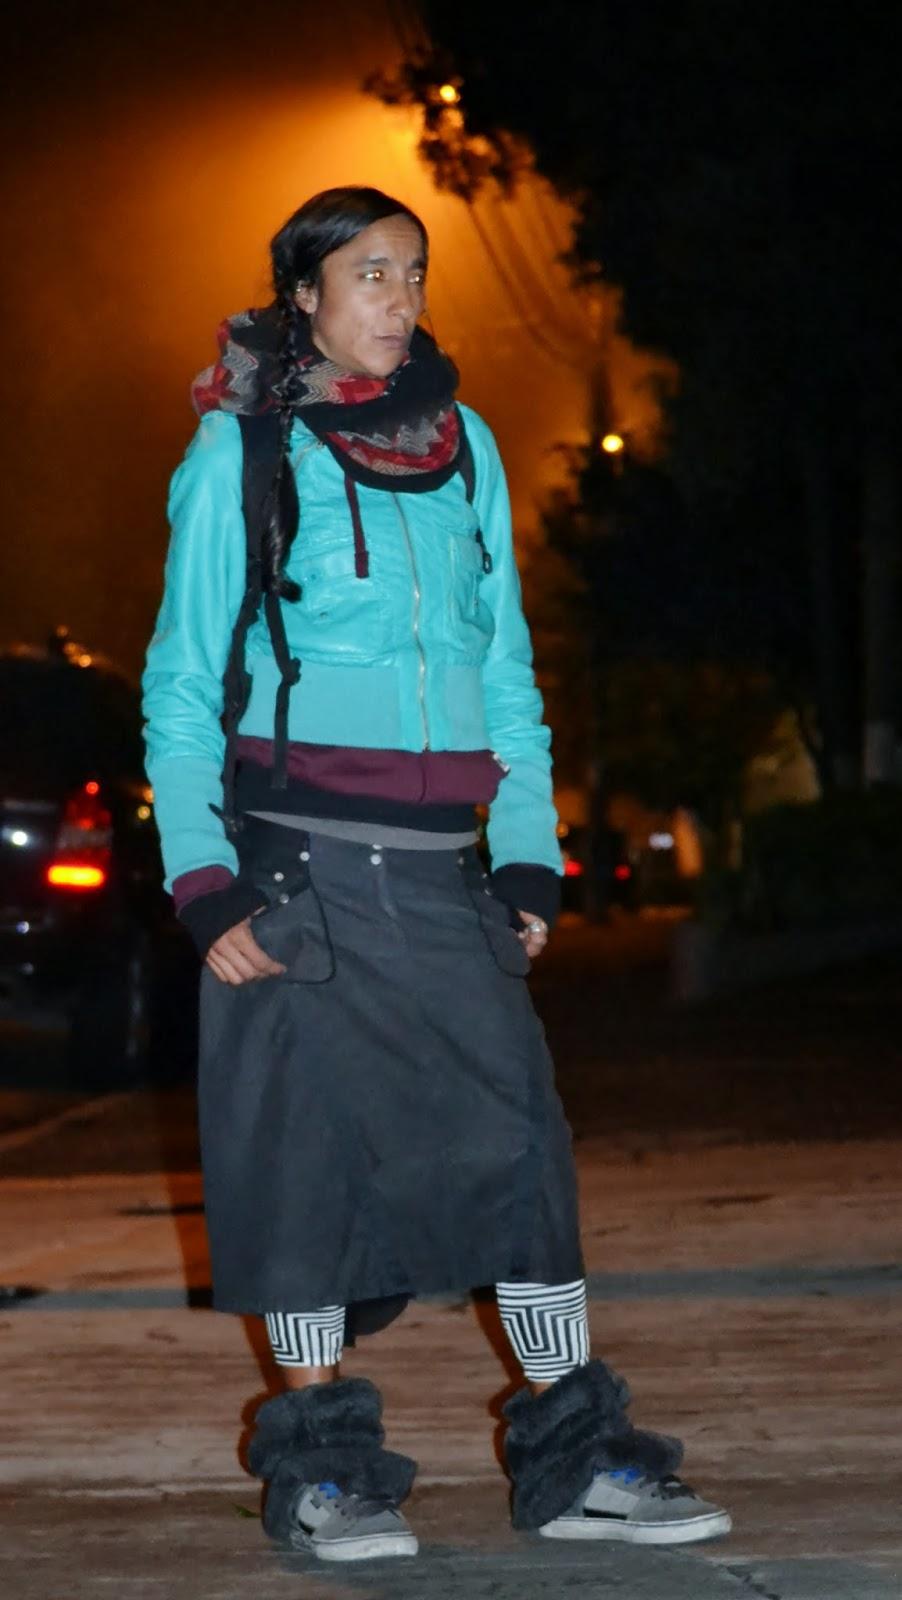 Flaca paseando en leggigns vinilo 6